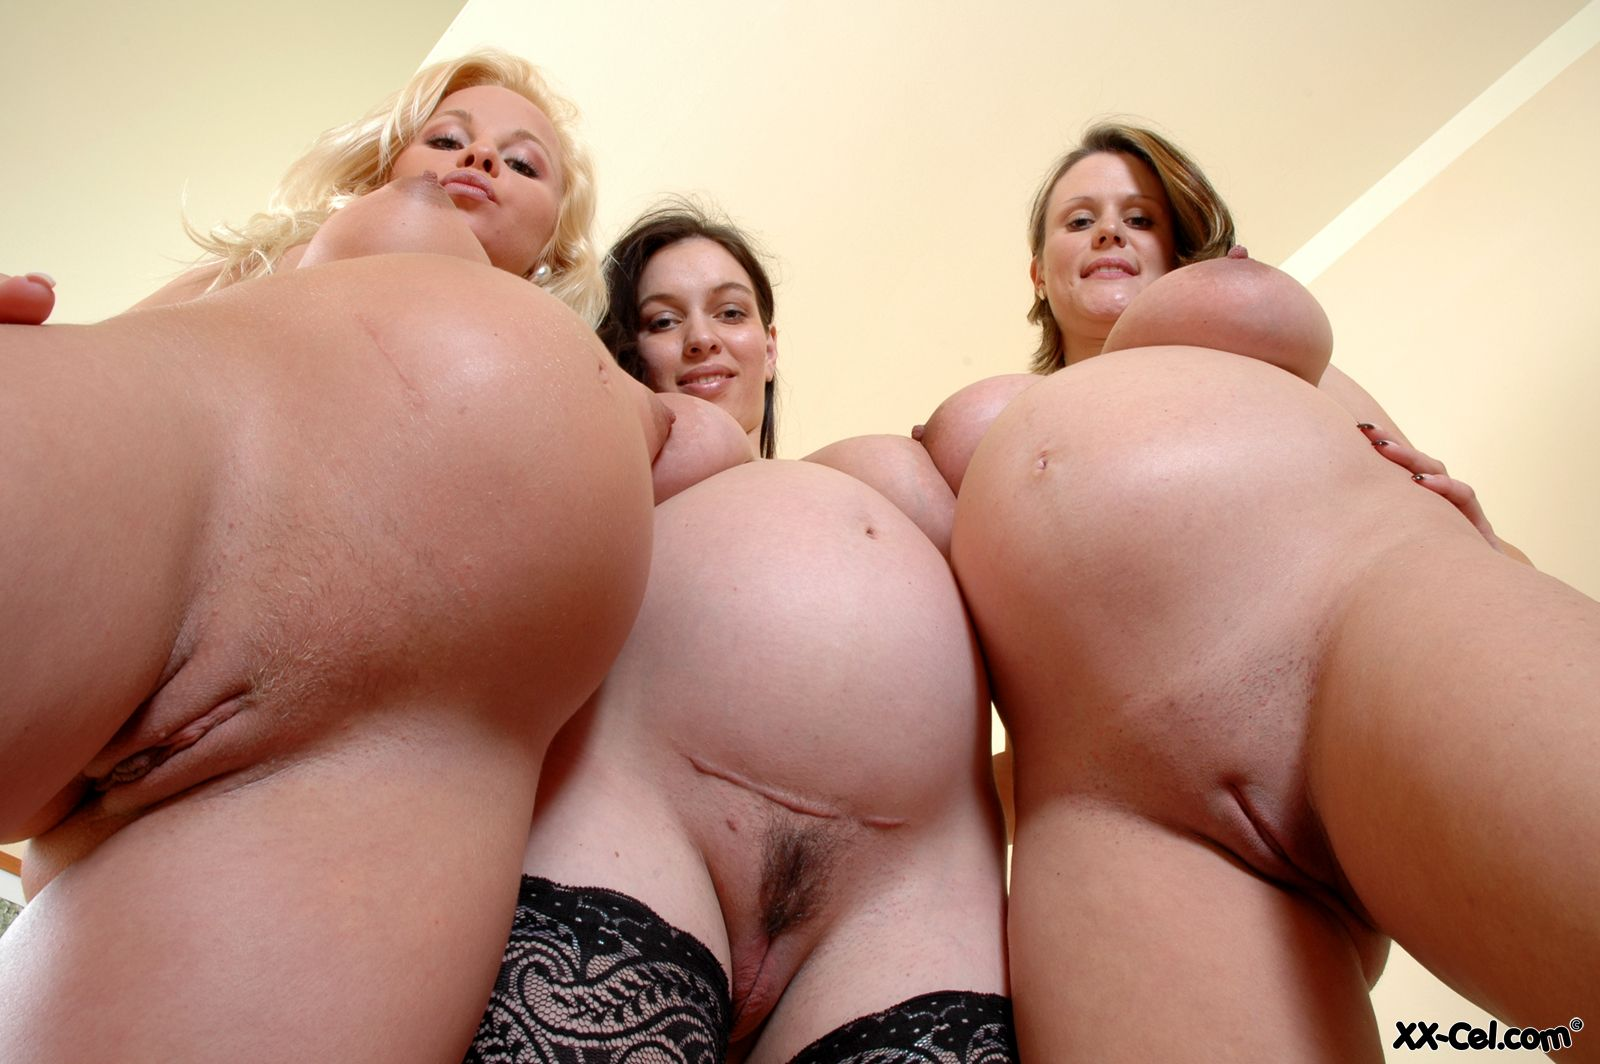 pregnant lesbians topless